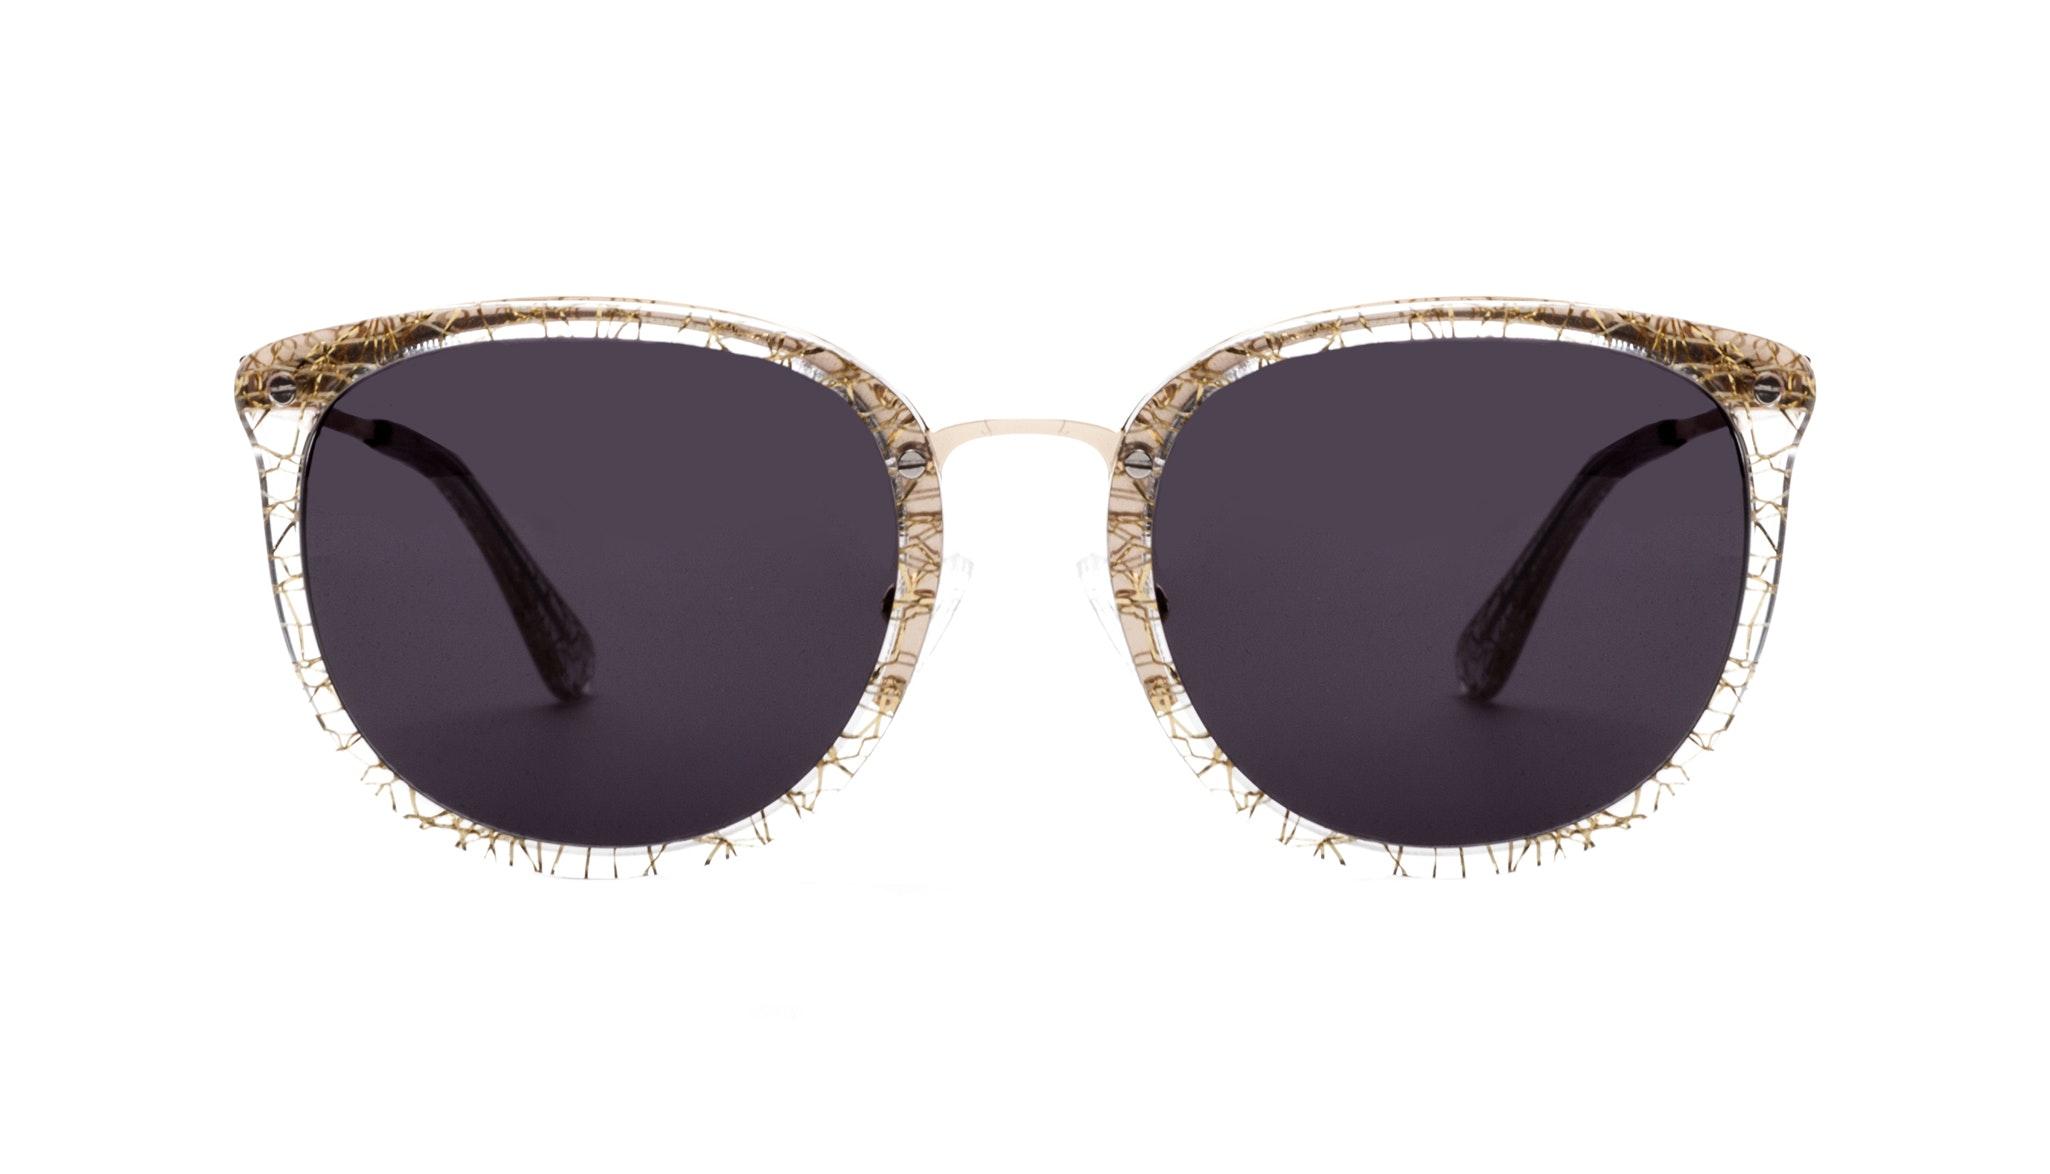 Affordable Fashion Glasses Square Round Sunglasses Women Amaze Champagne Front